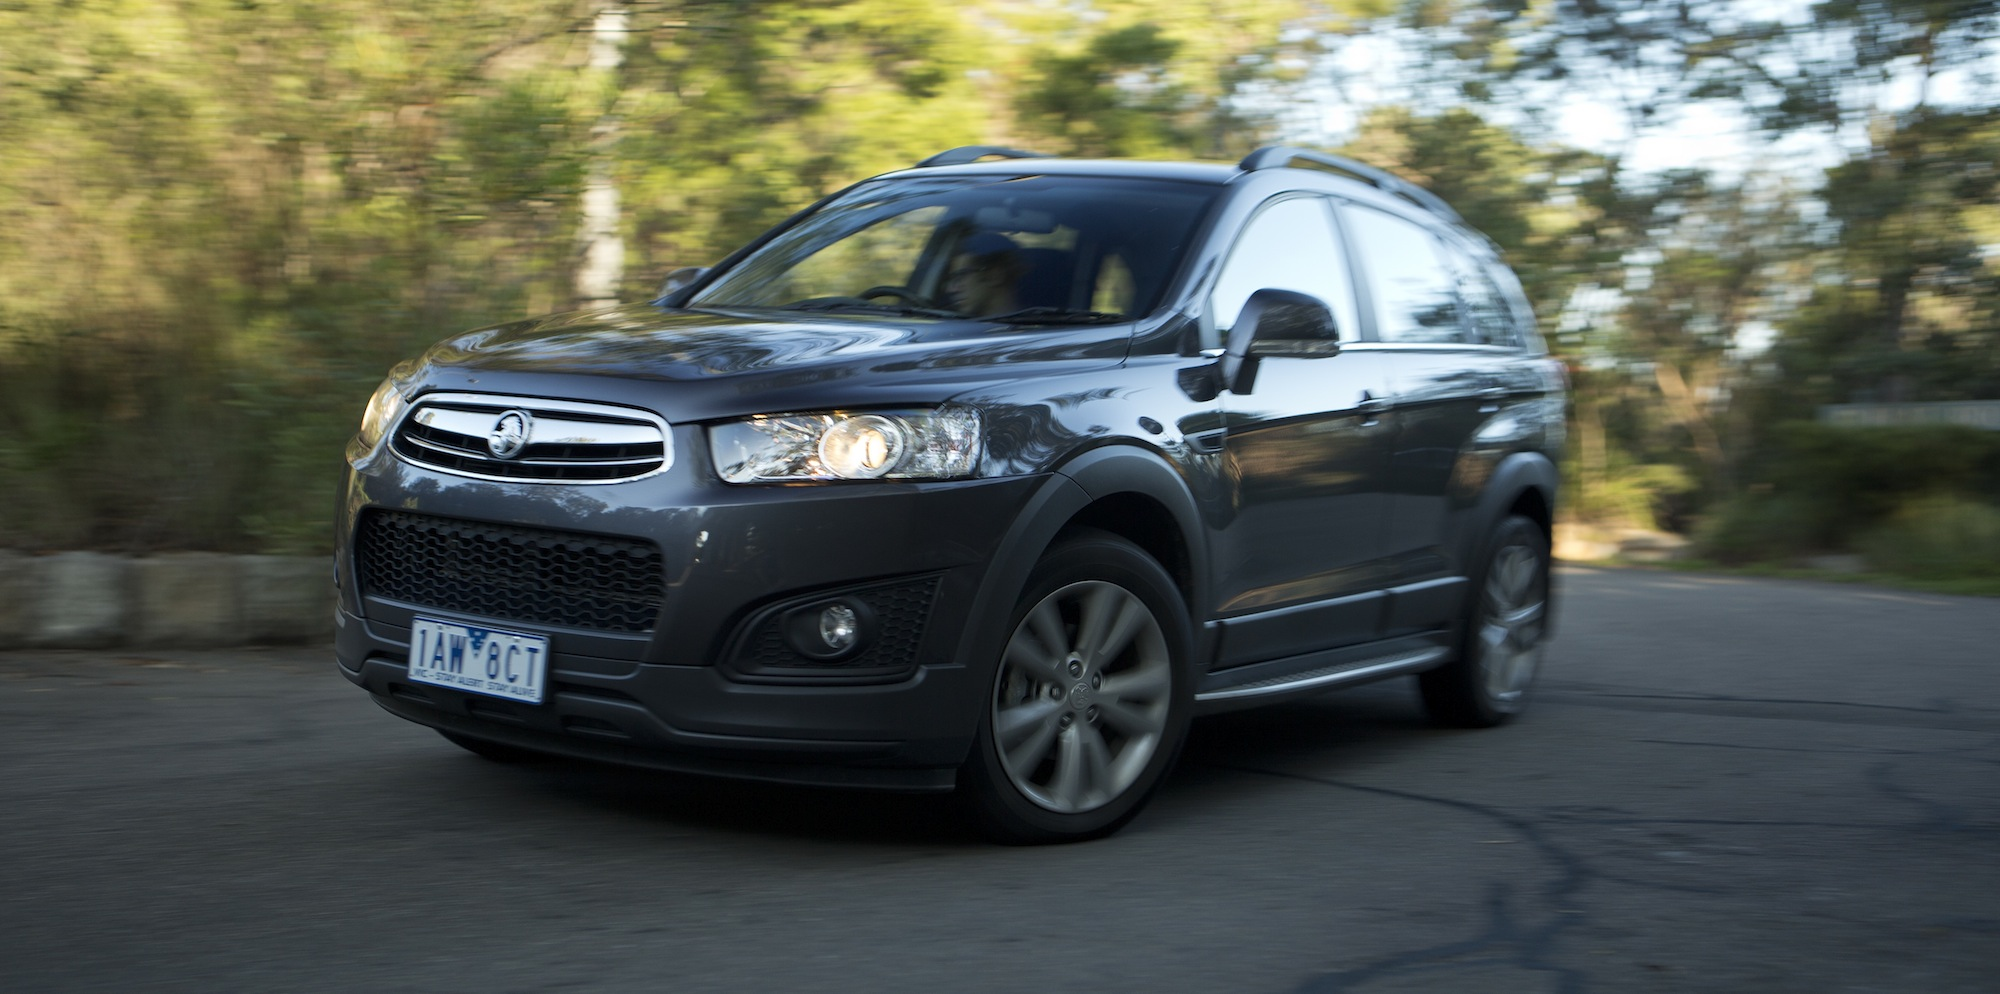 2014 Holden Captiva 7 Review: LT 3 0-litre V6 petrol   CarAdvice